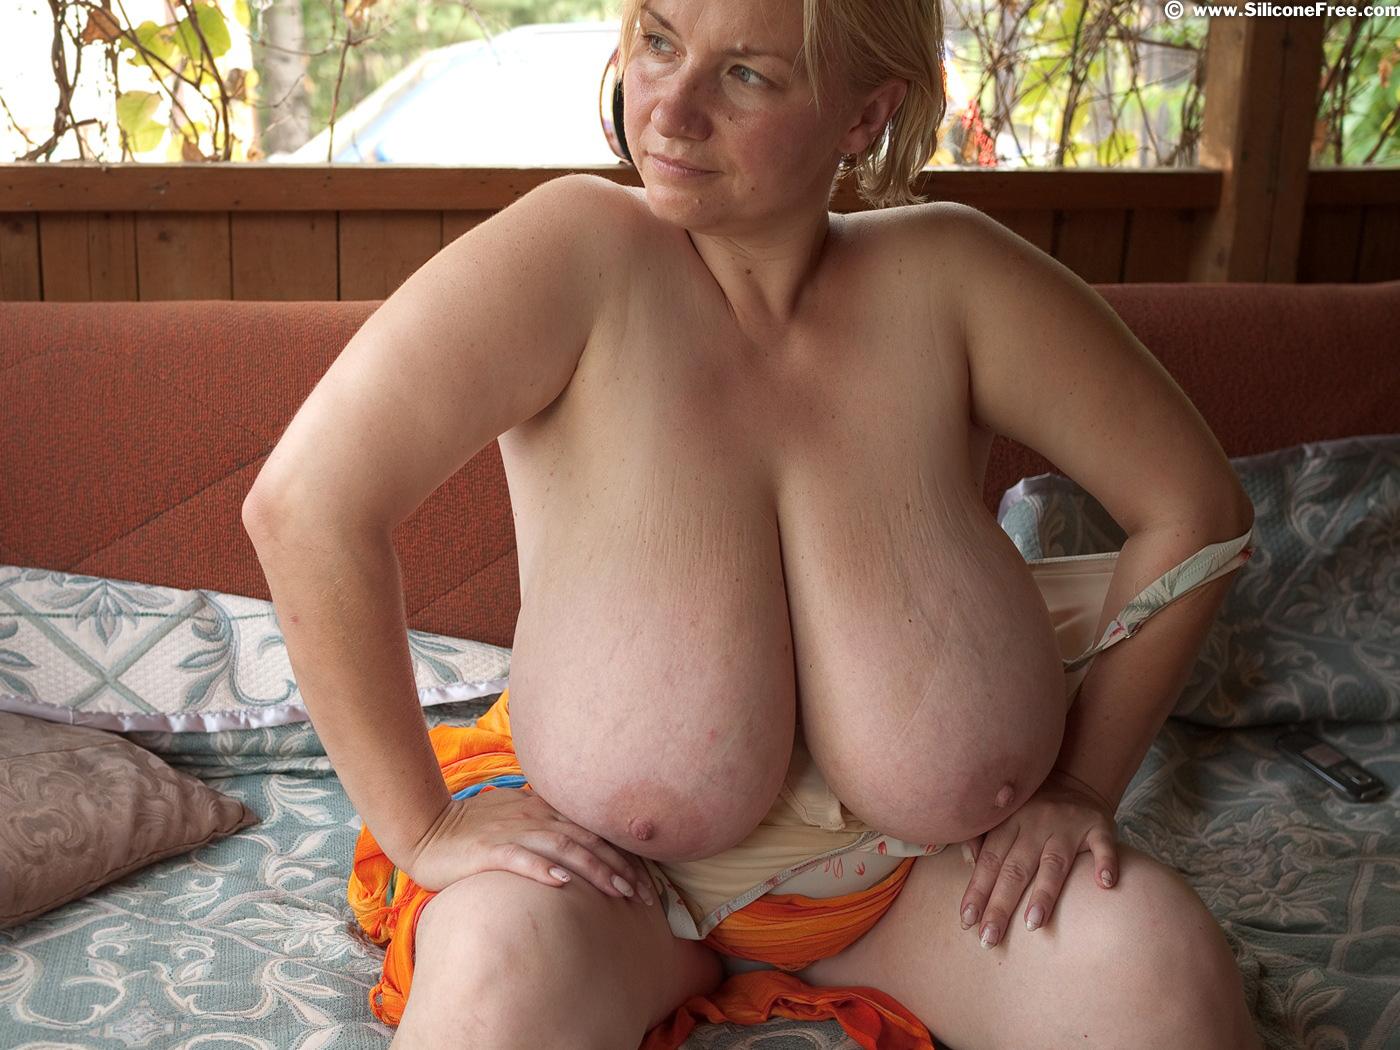 Sexy hot nude grandma